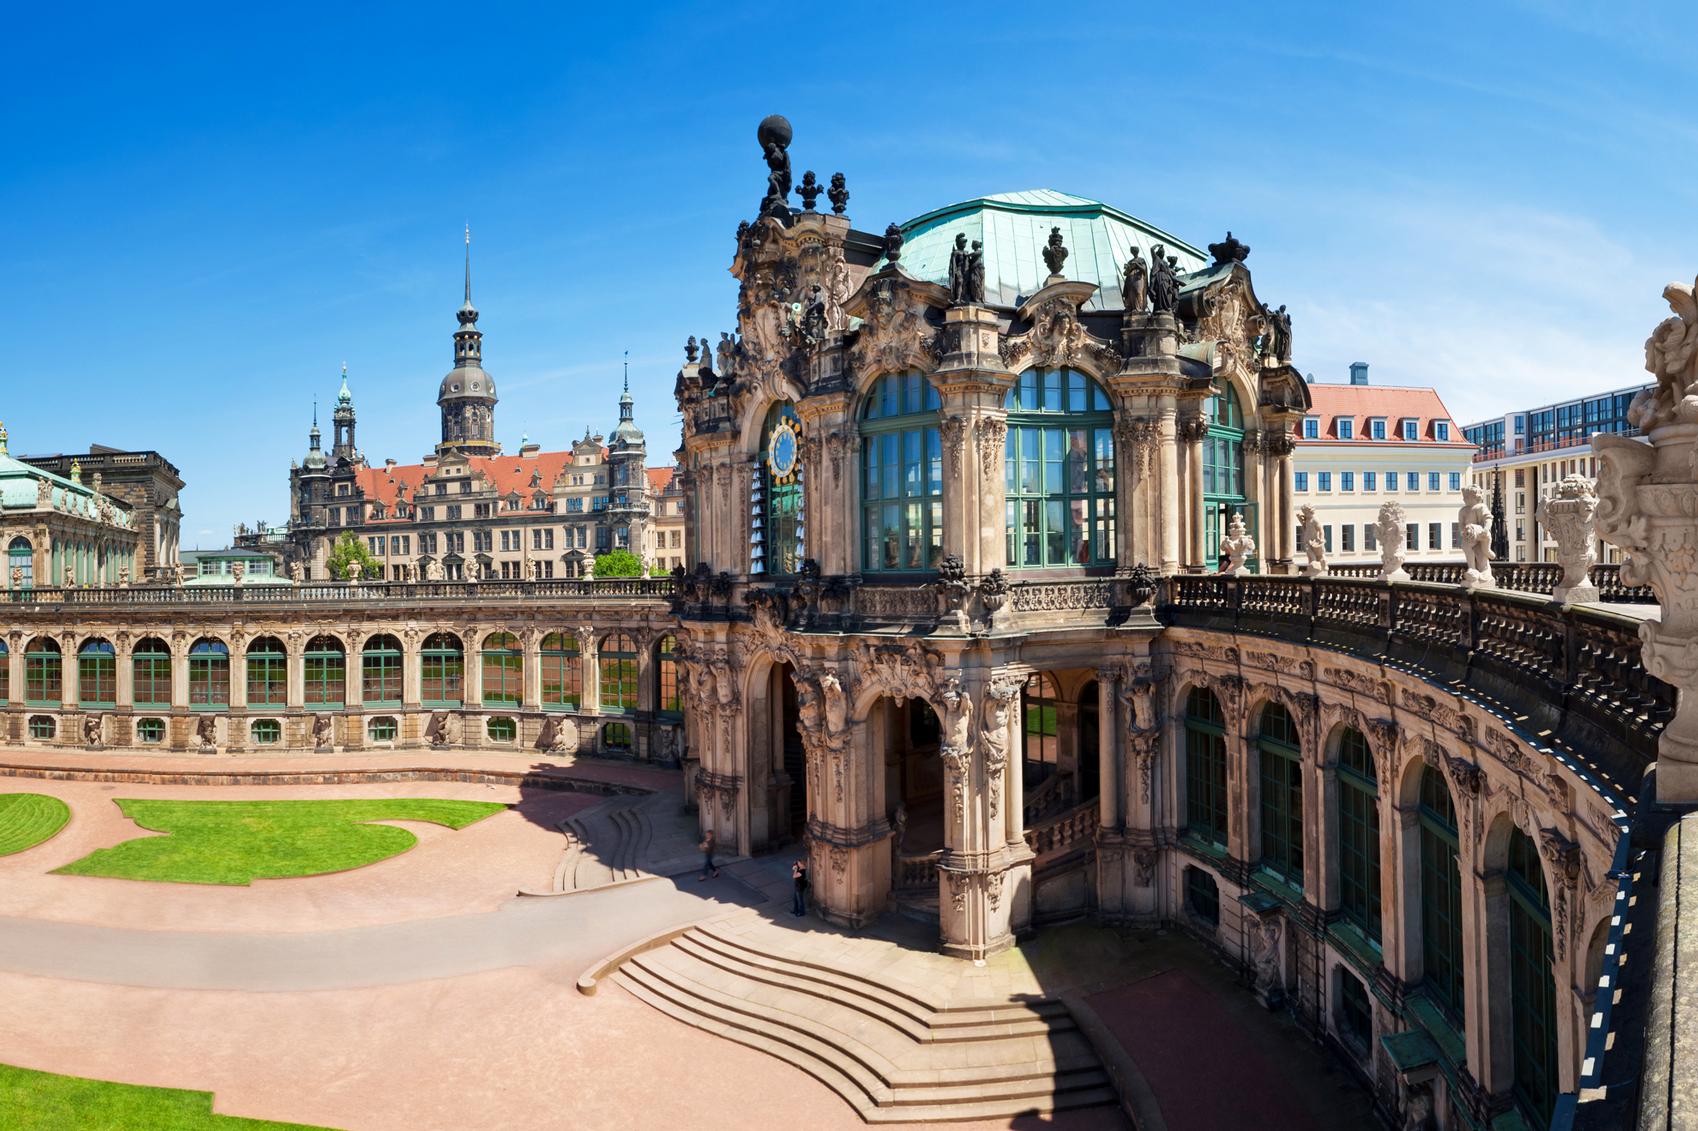 Incredible German Sights The-Zwinger-Dresden-www.istockphoto.com_gb_photo_the-zwinger-dresden-gm182866188-13654142-TommL